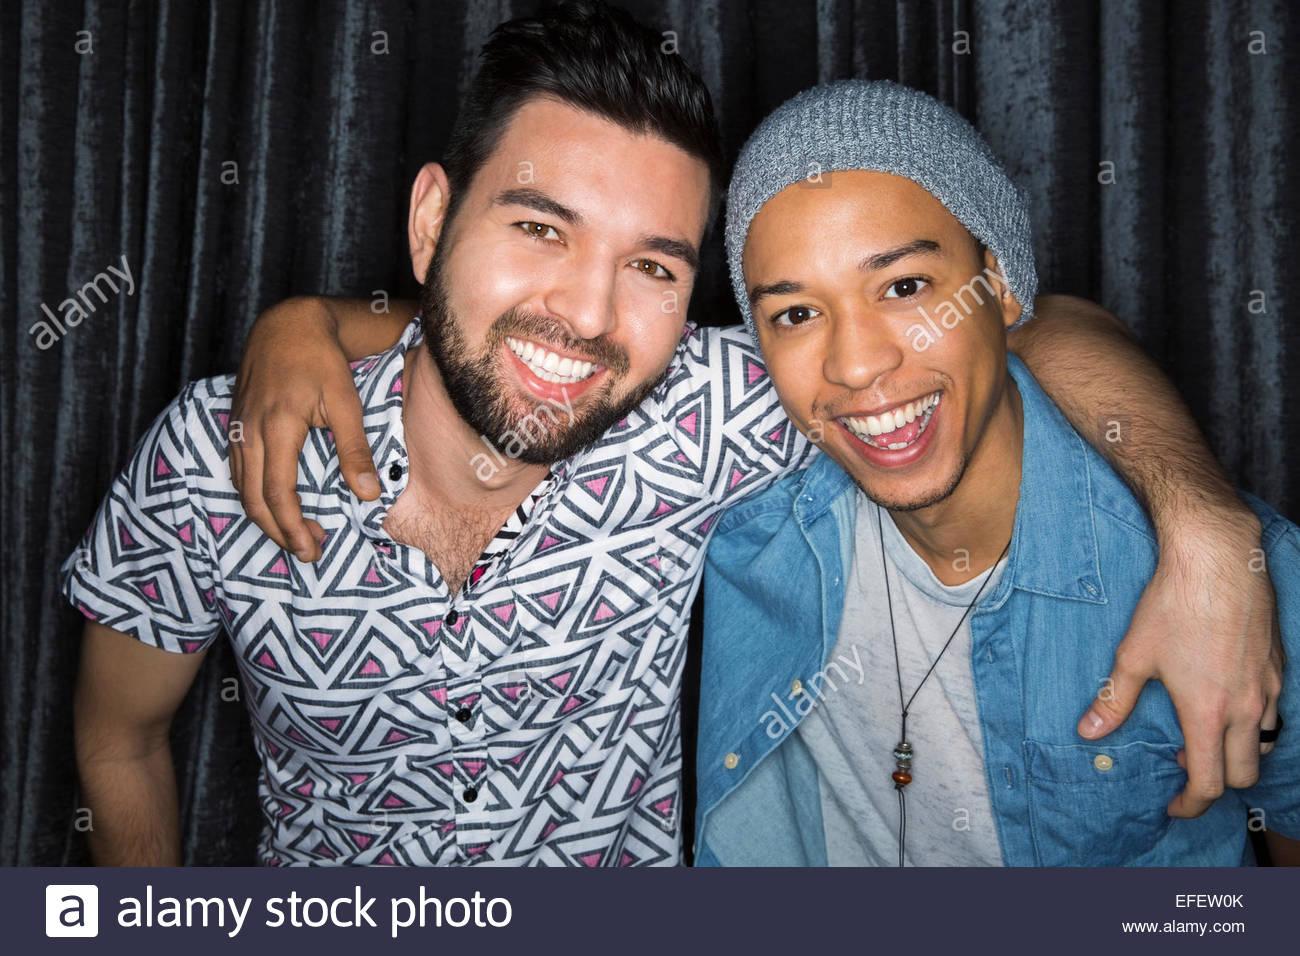 Portrait of smiling men hugging - Stock Image